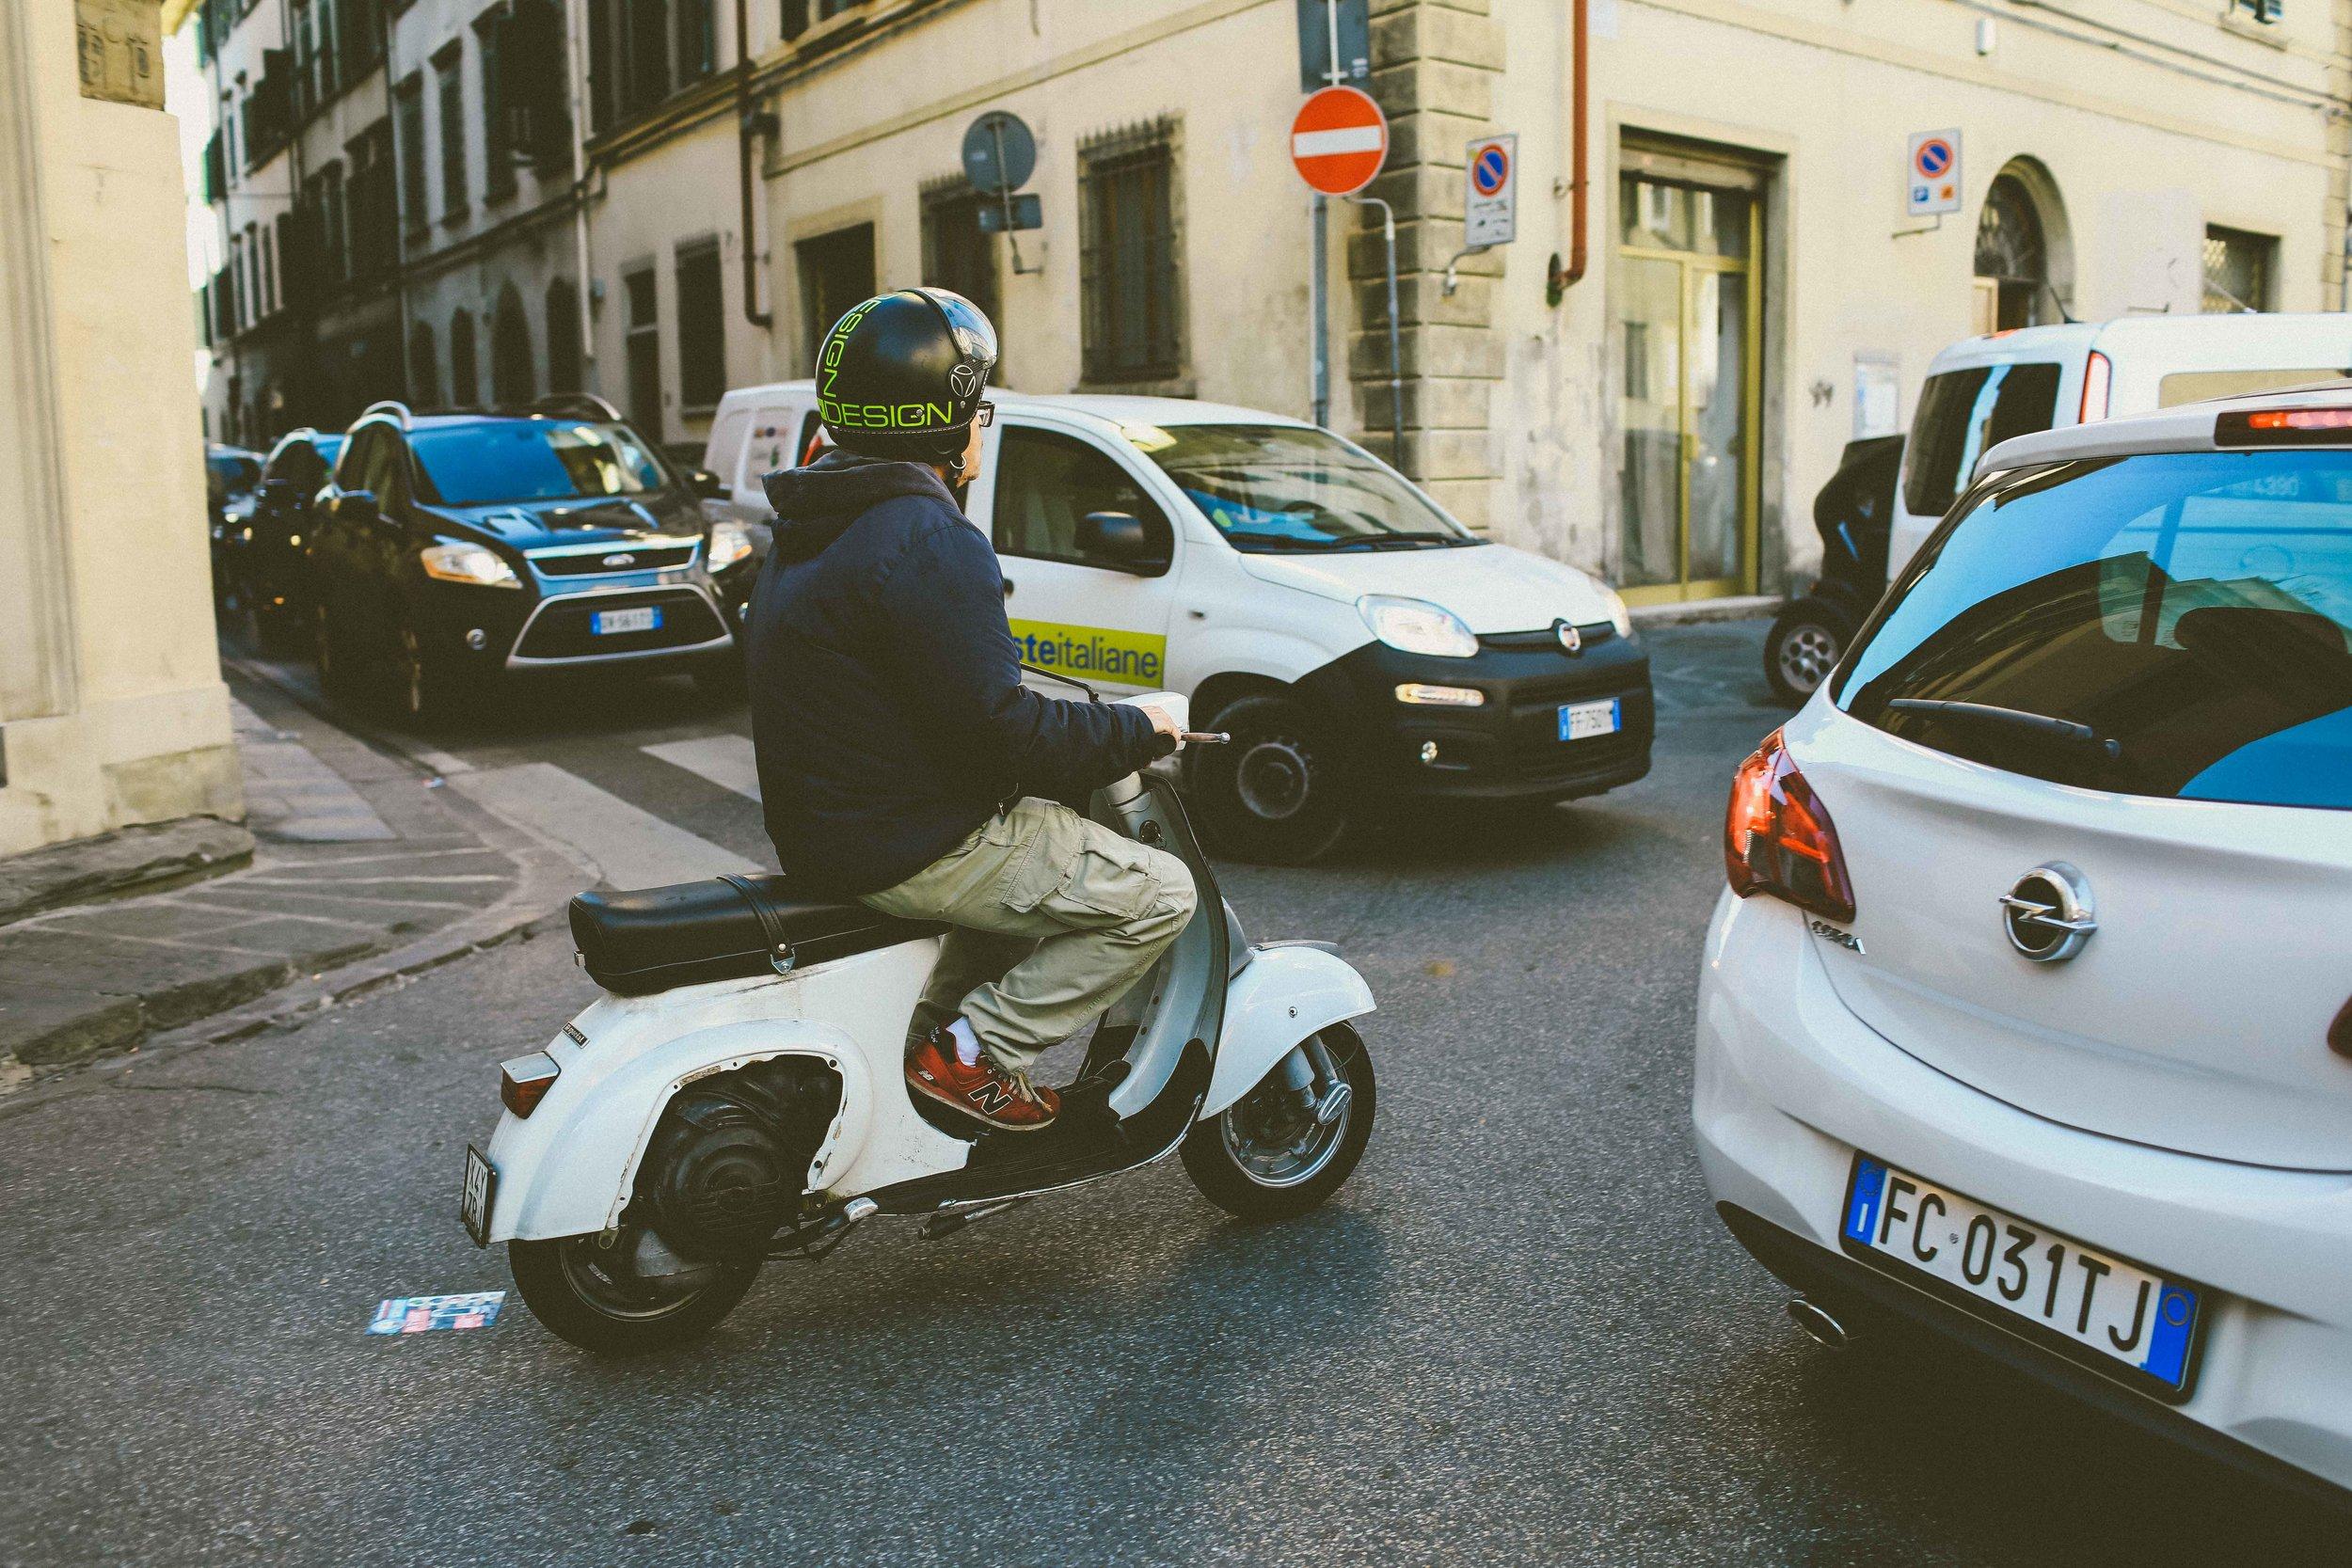 Street_Photographer_Florence_Italy_6.jpg